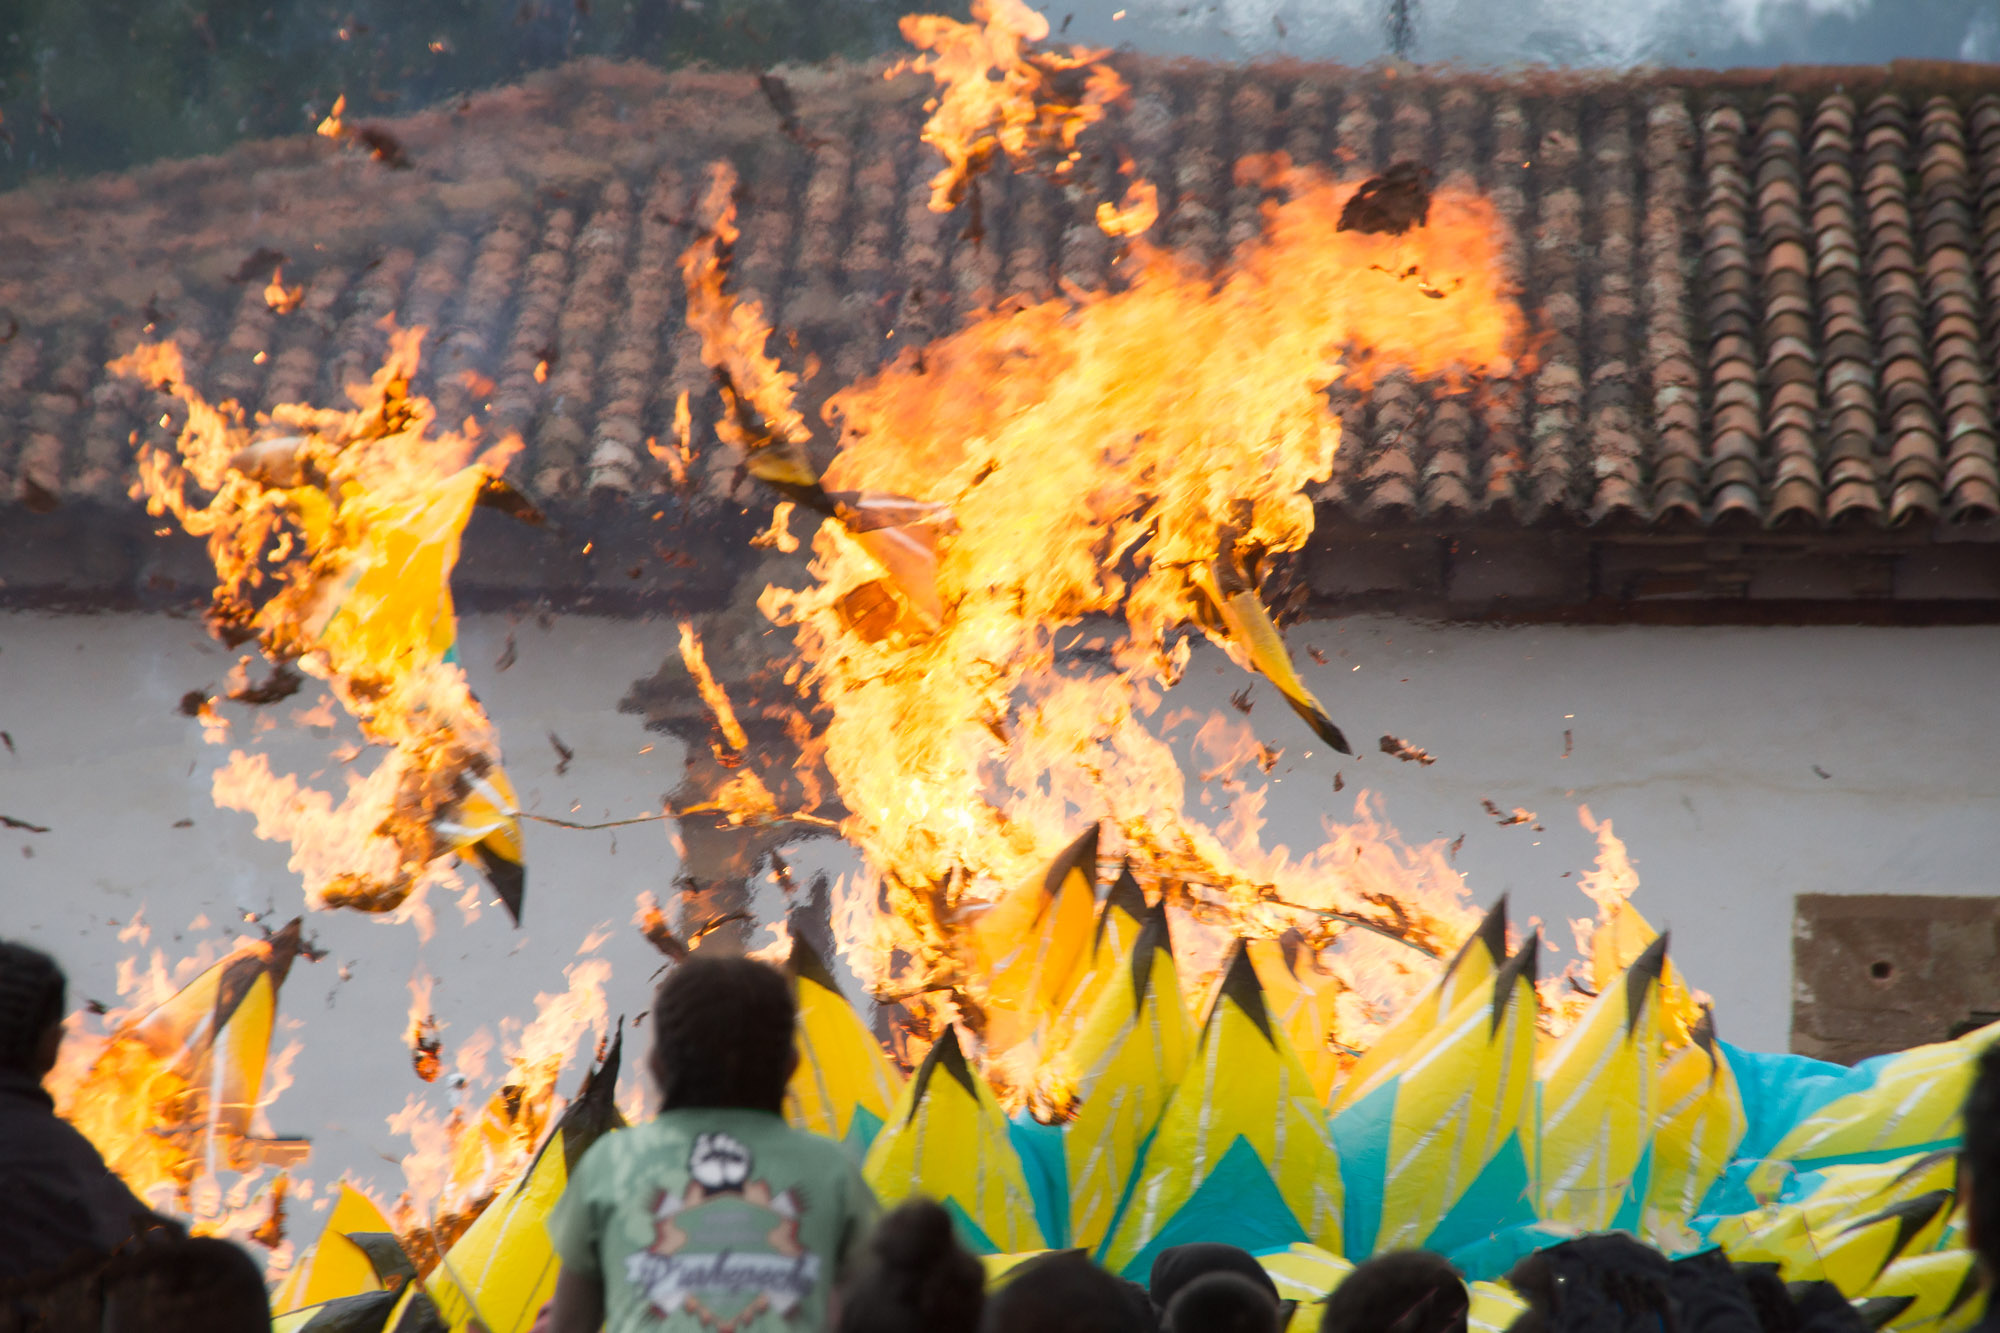 Flaming Porcupine   CantoyaFest: Pátzcuaro, Michoacán, Mexico — Sunday, July 23, 2017